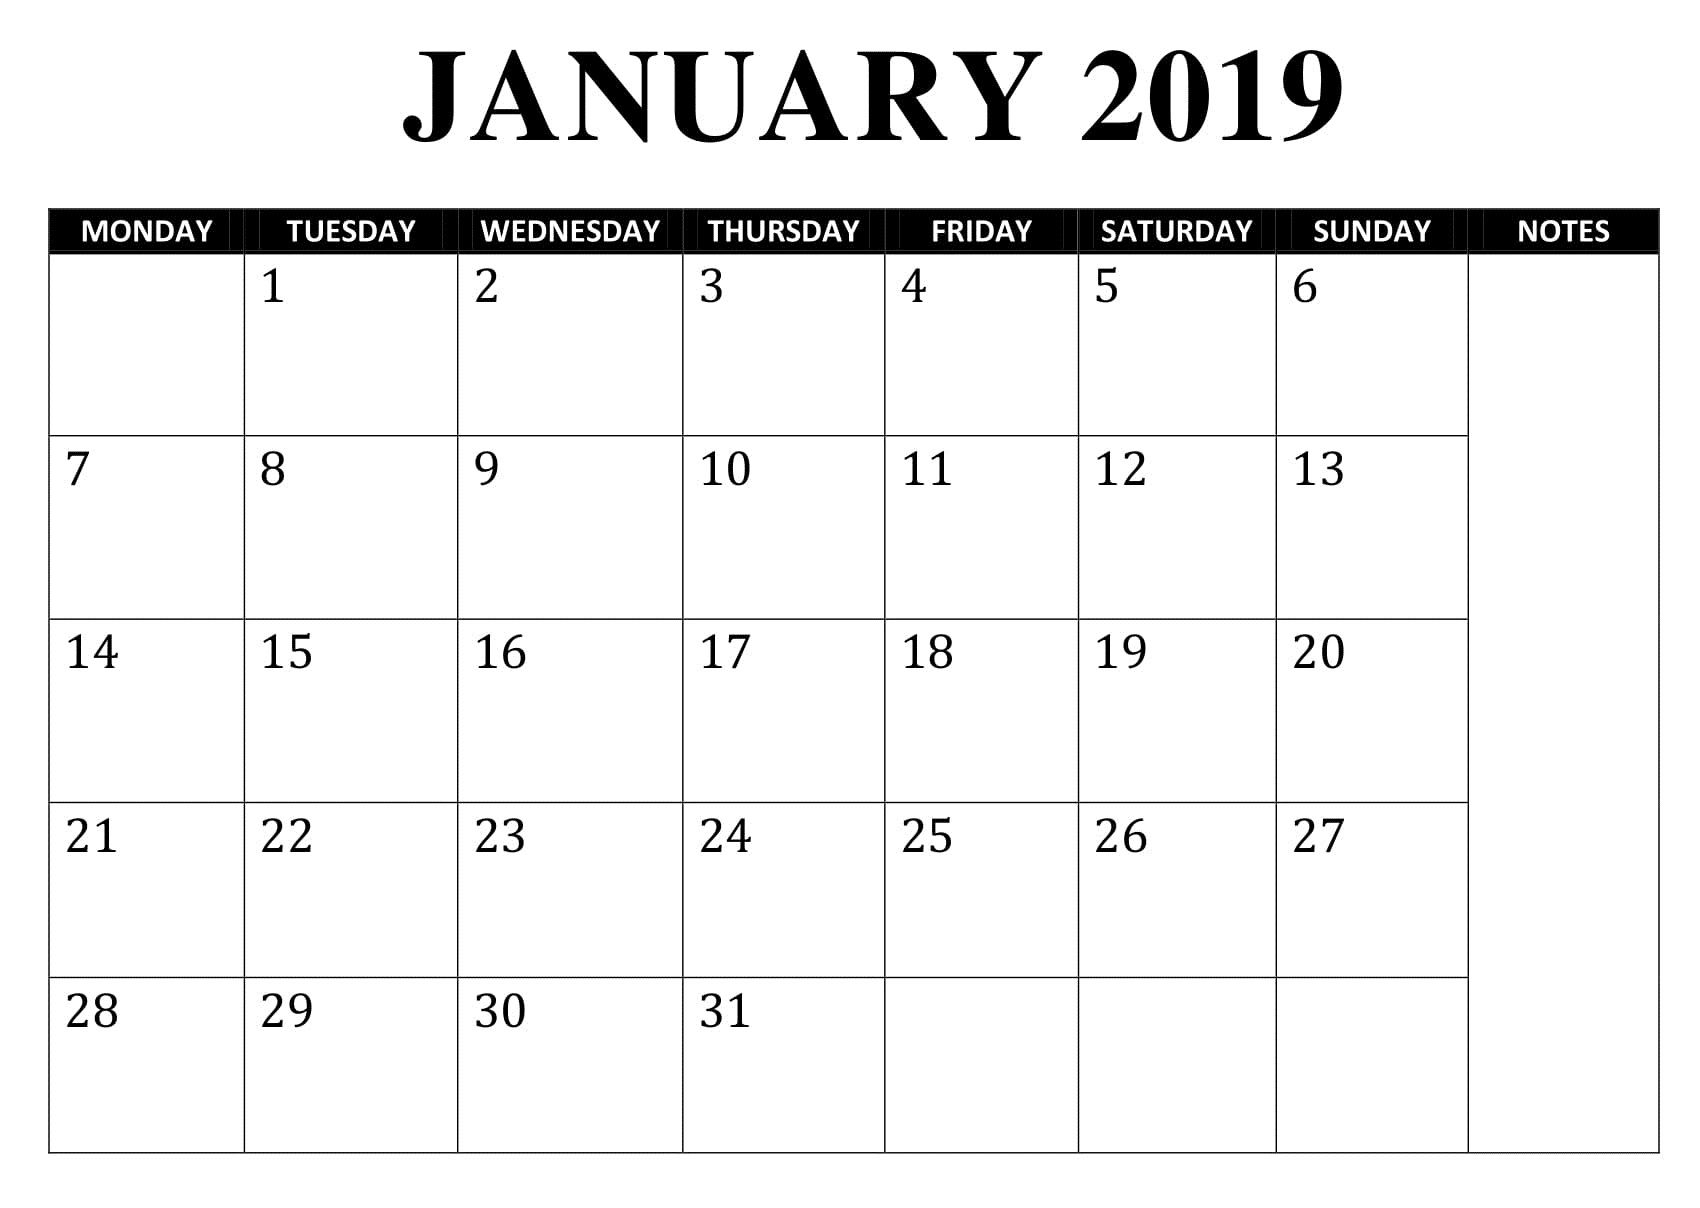 Blank January 2019 Calendar | Calendar Template, 2019